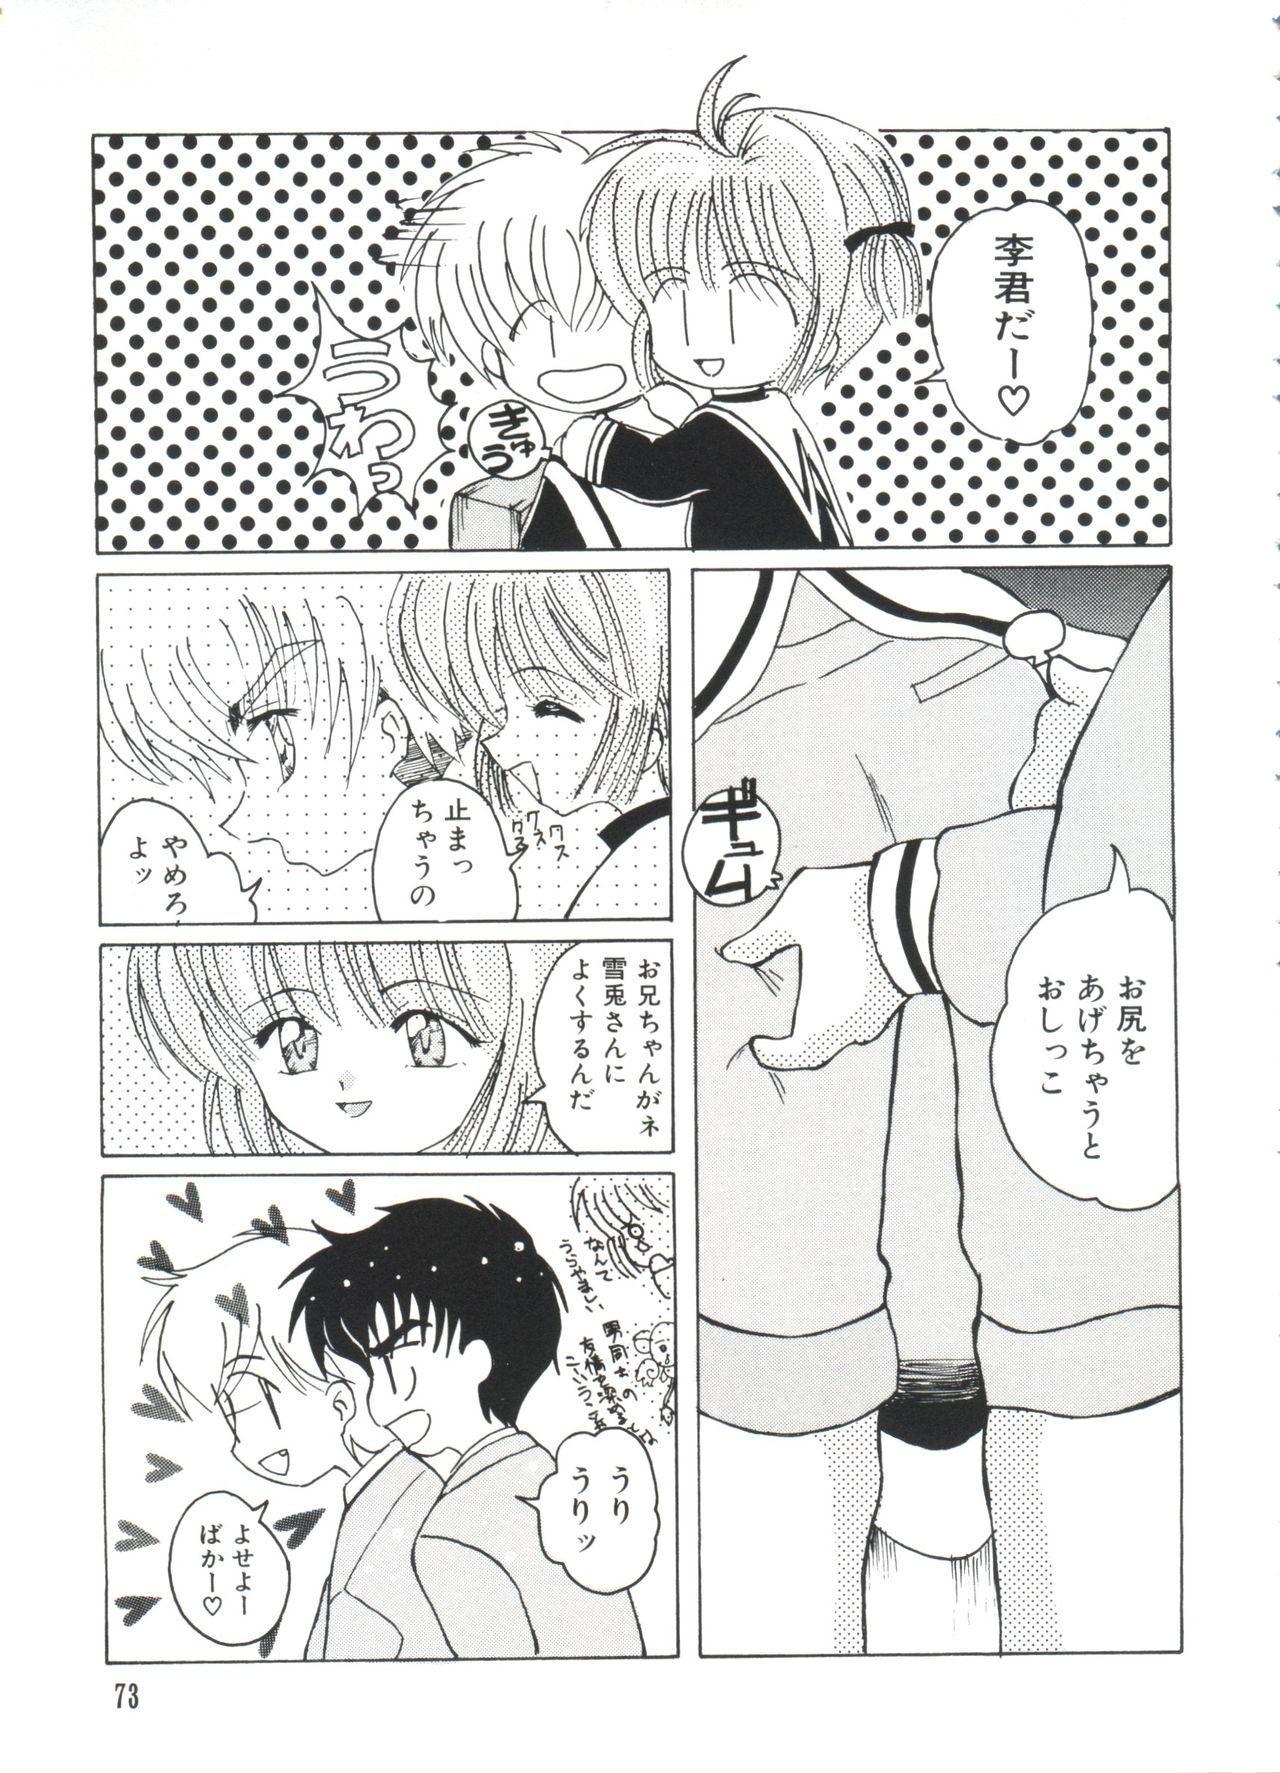 Ero-chan to Issho 2 74